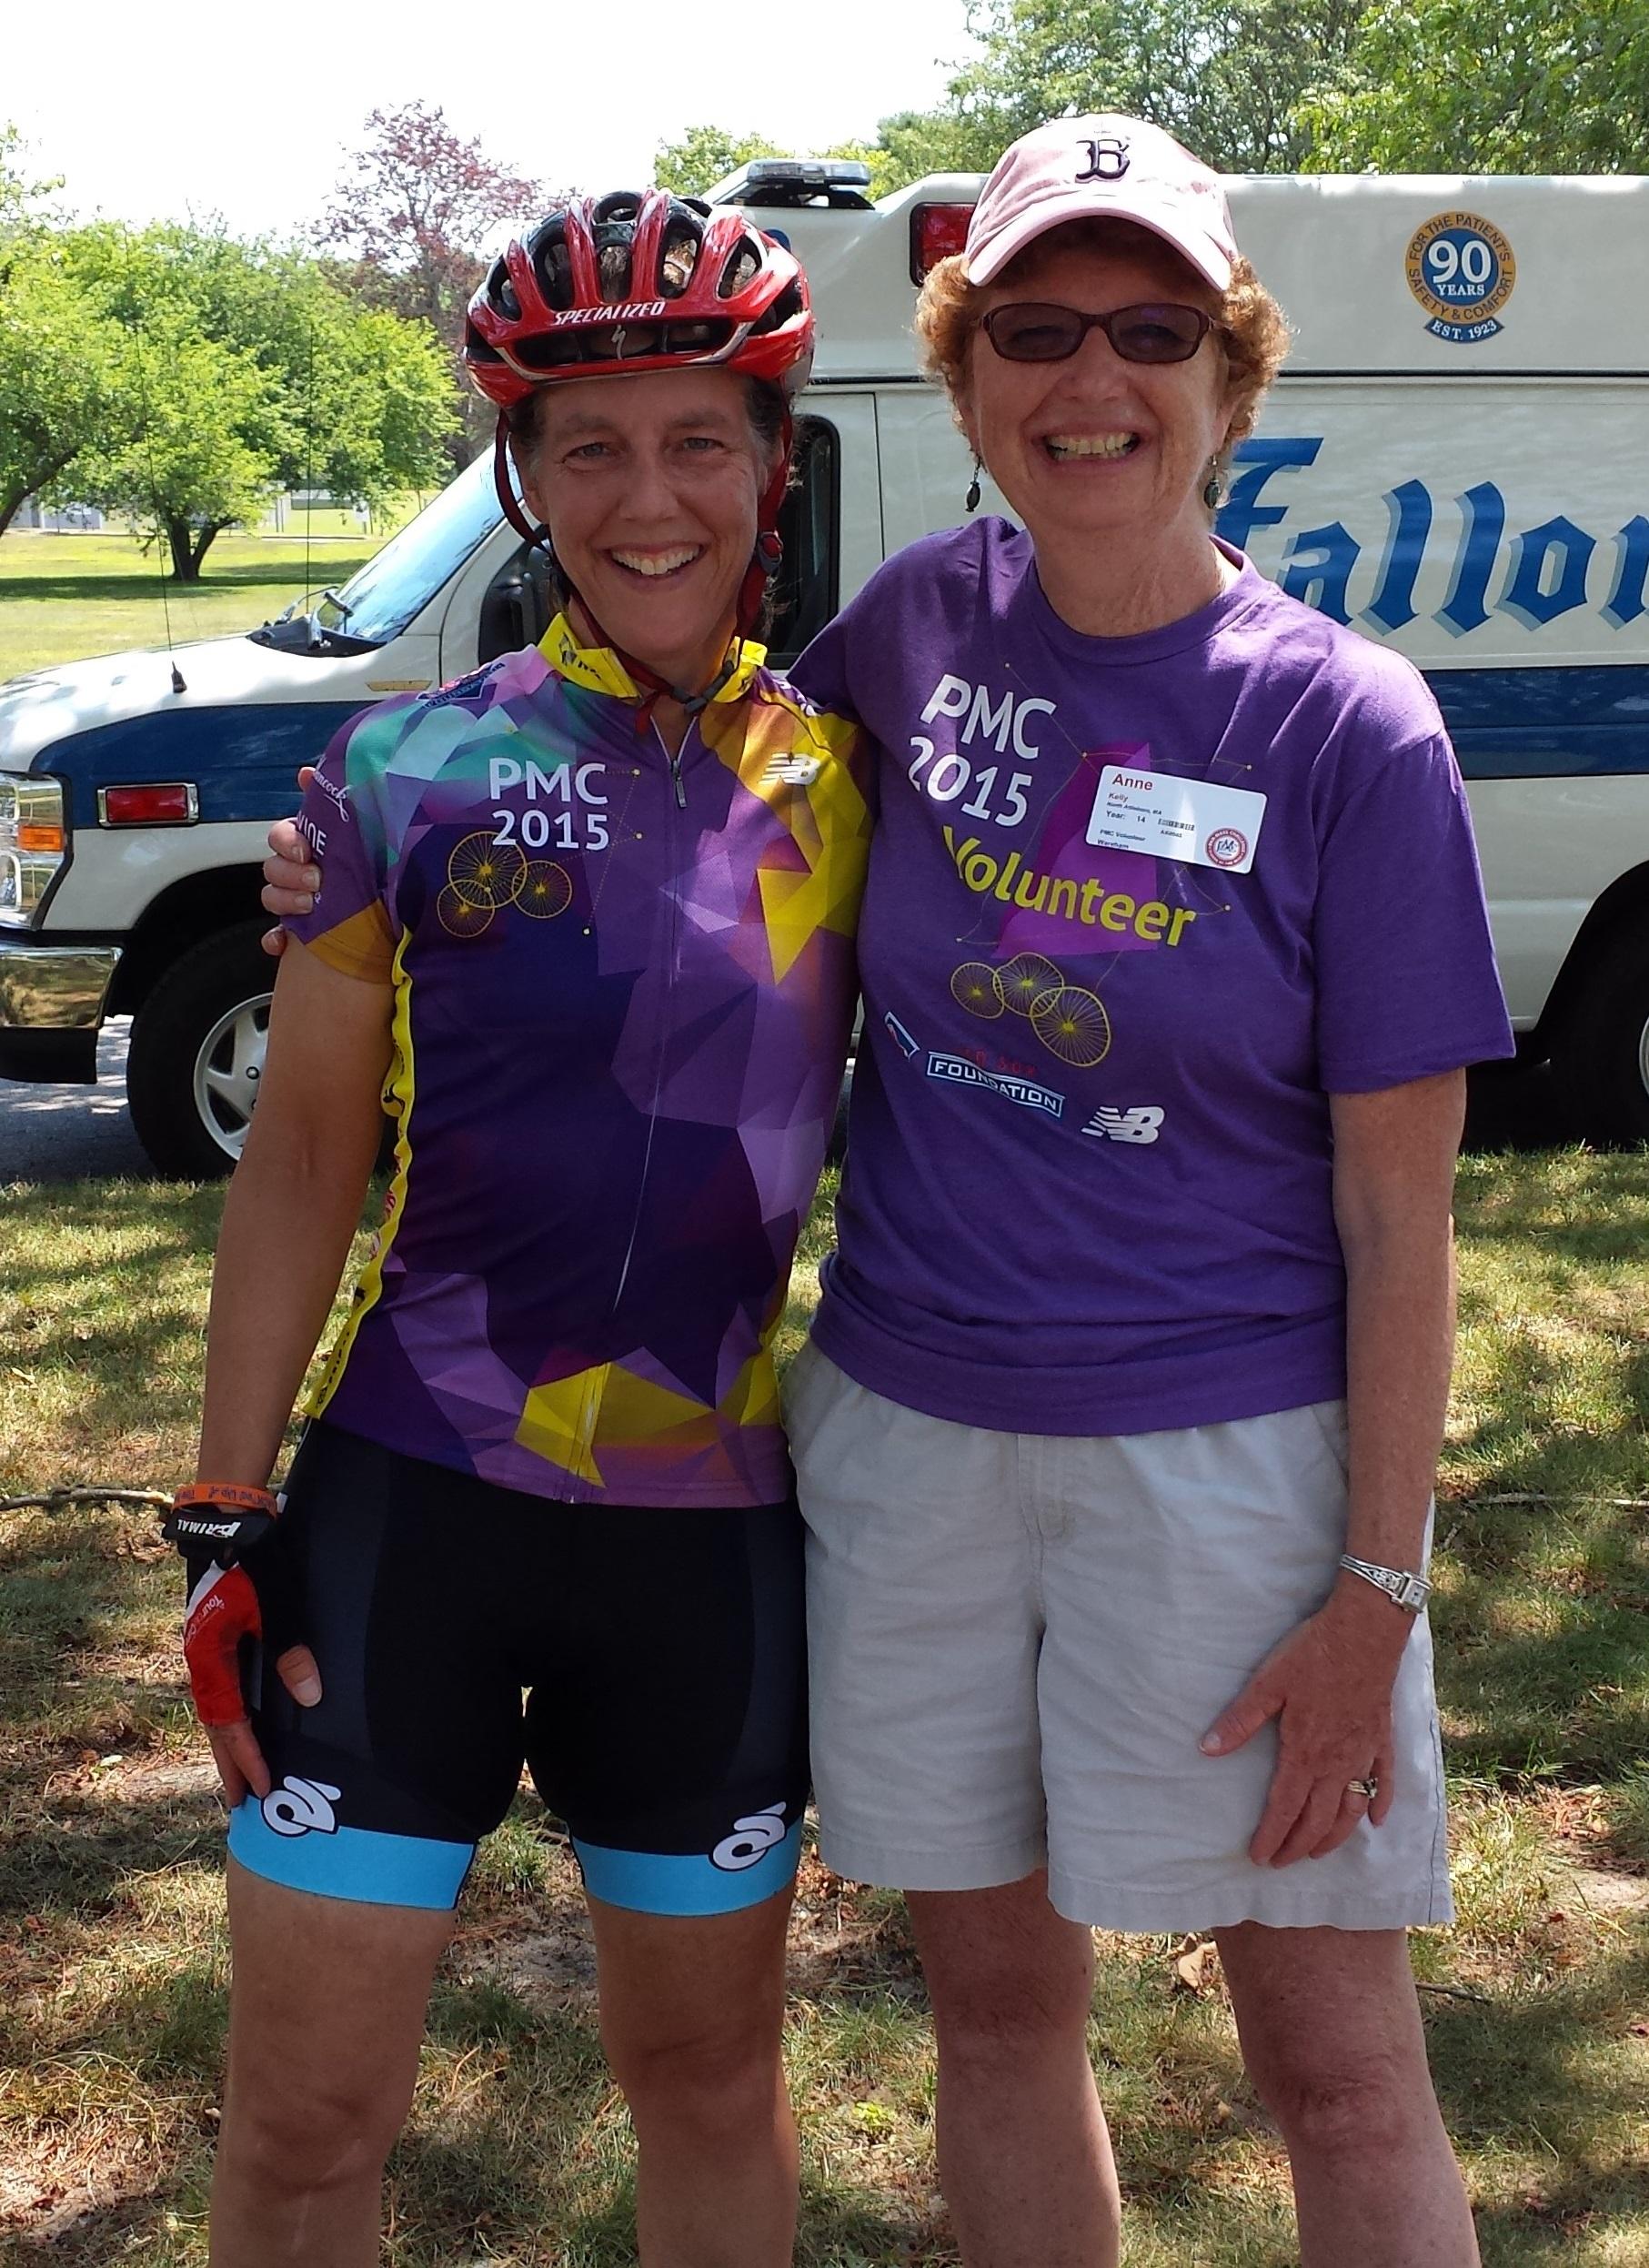 Jen Cunningham Butler, PMC, fundraising